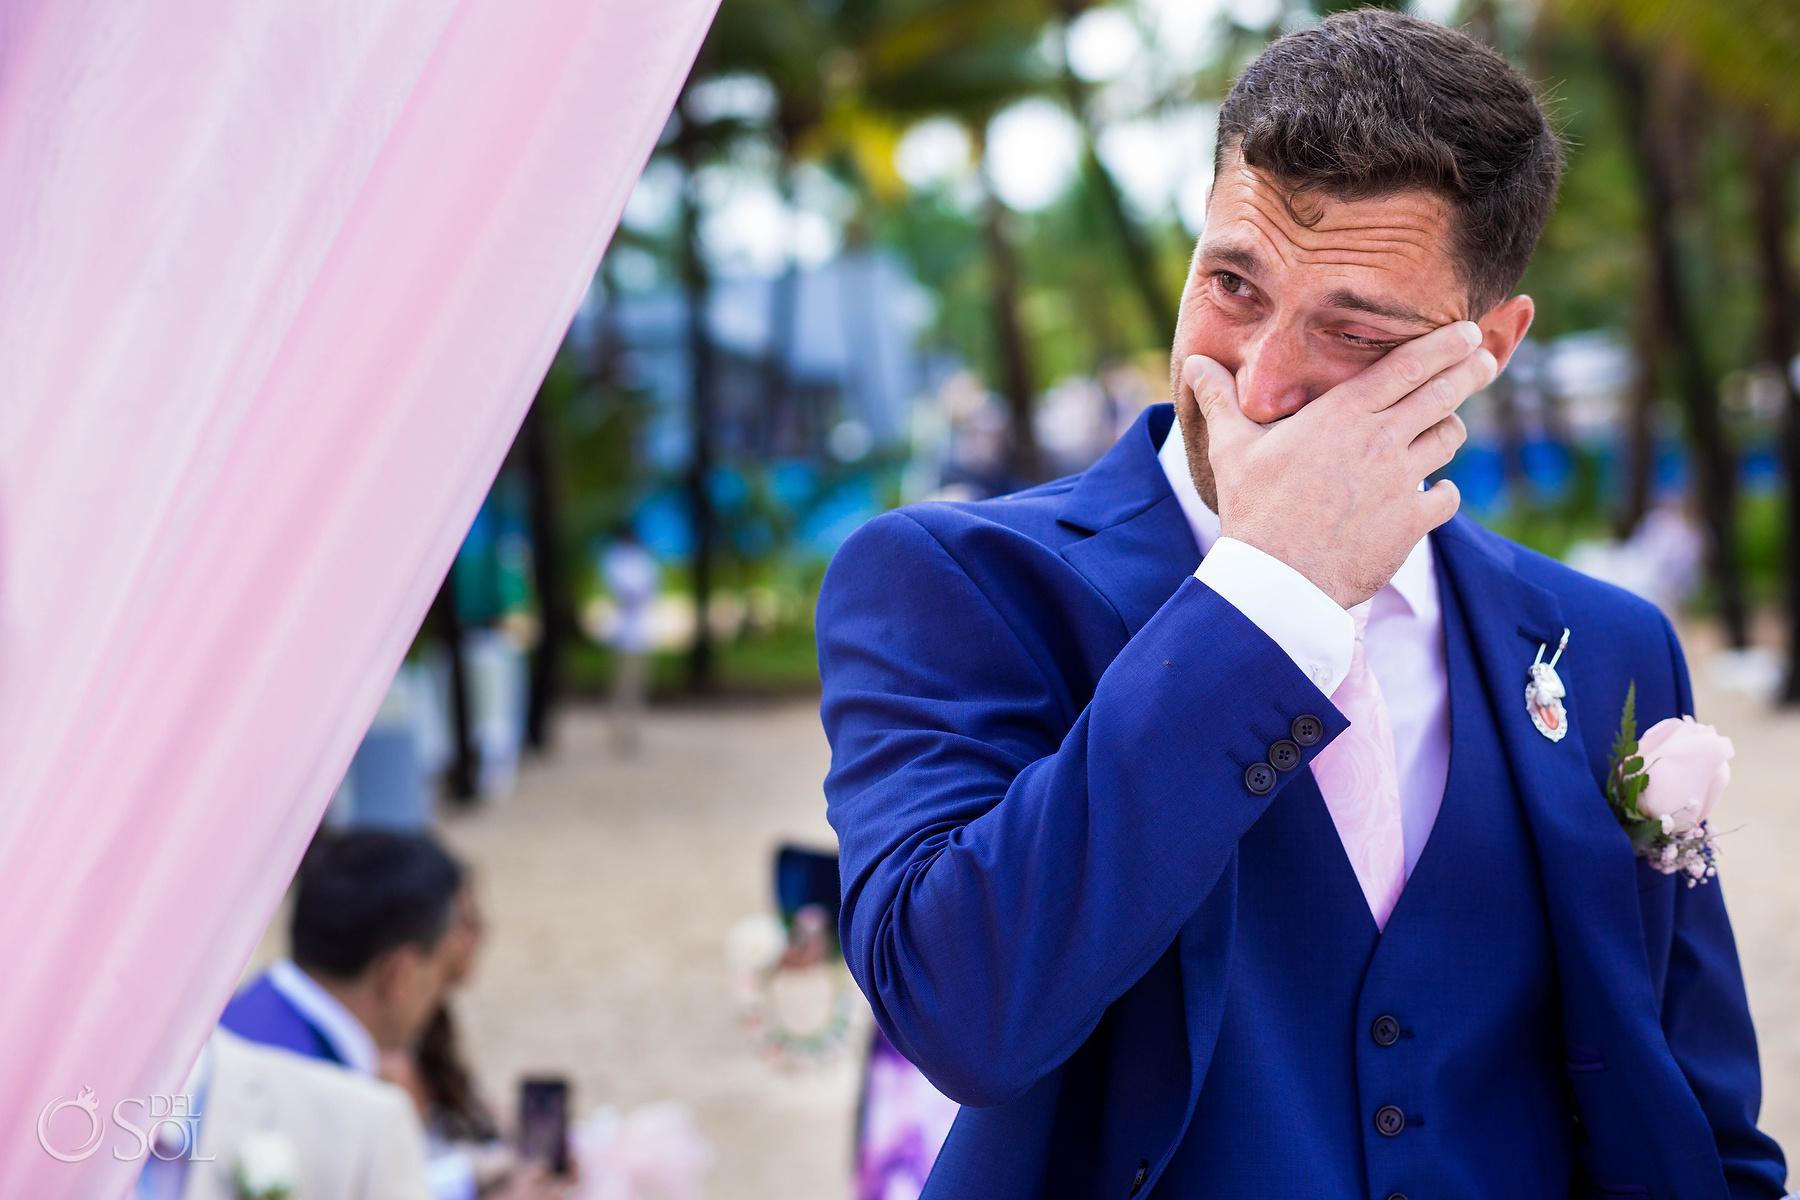 Emotional Groom Waiting at the beach wedding gazebo